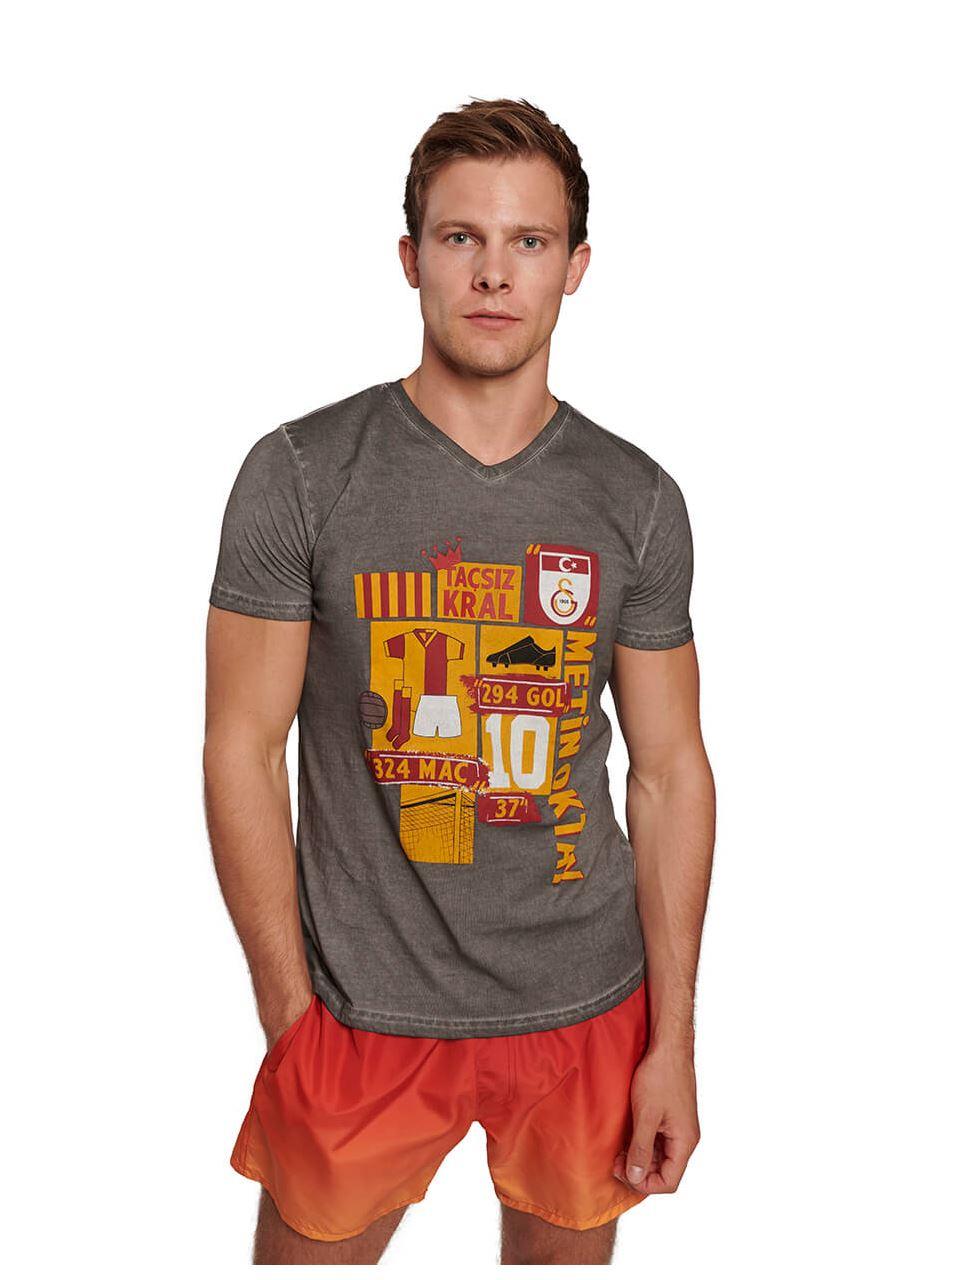 E90080 T-shirt